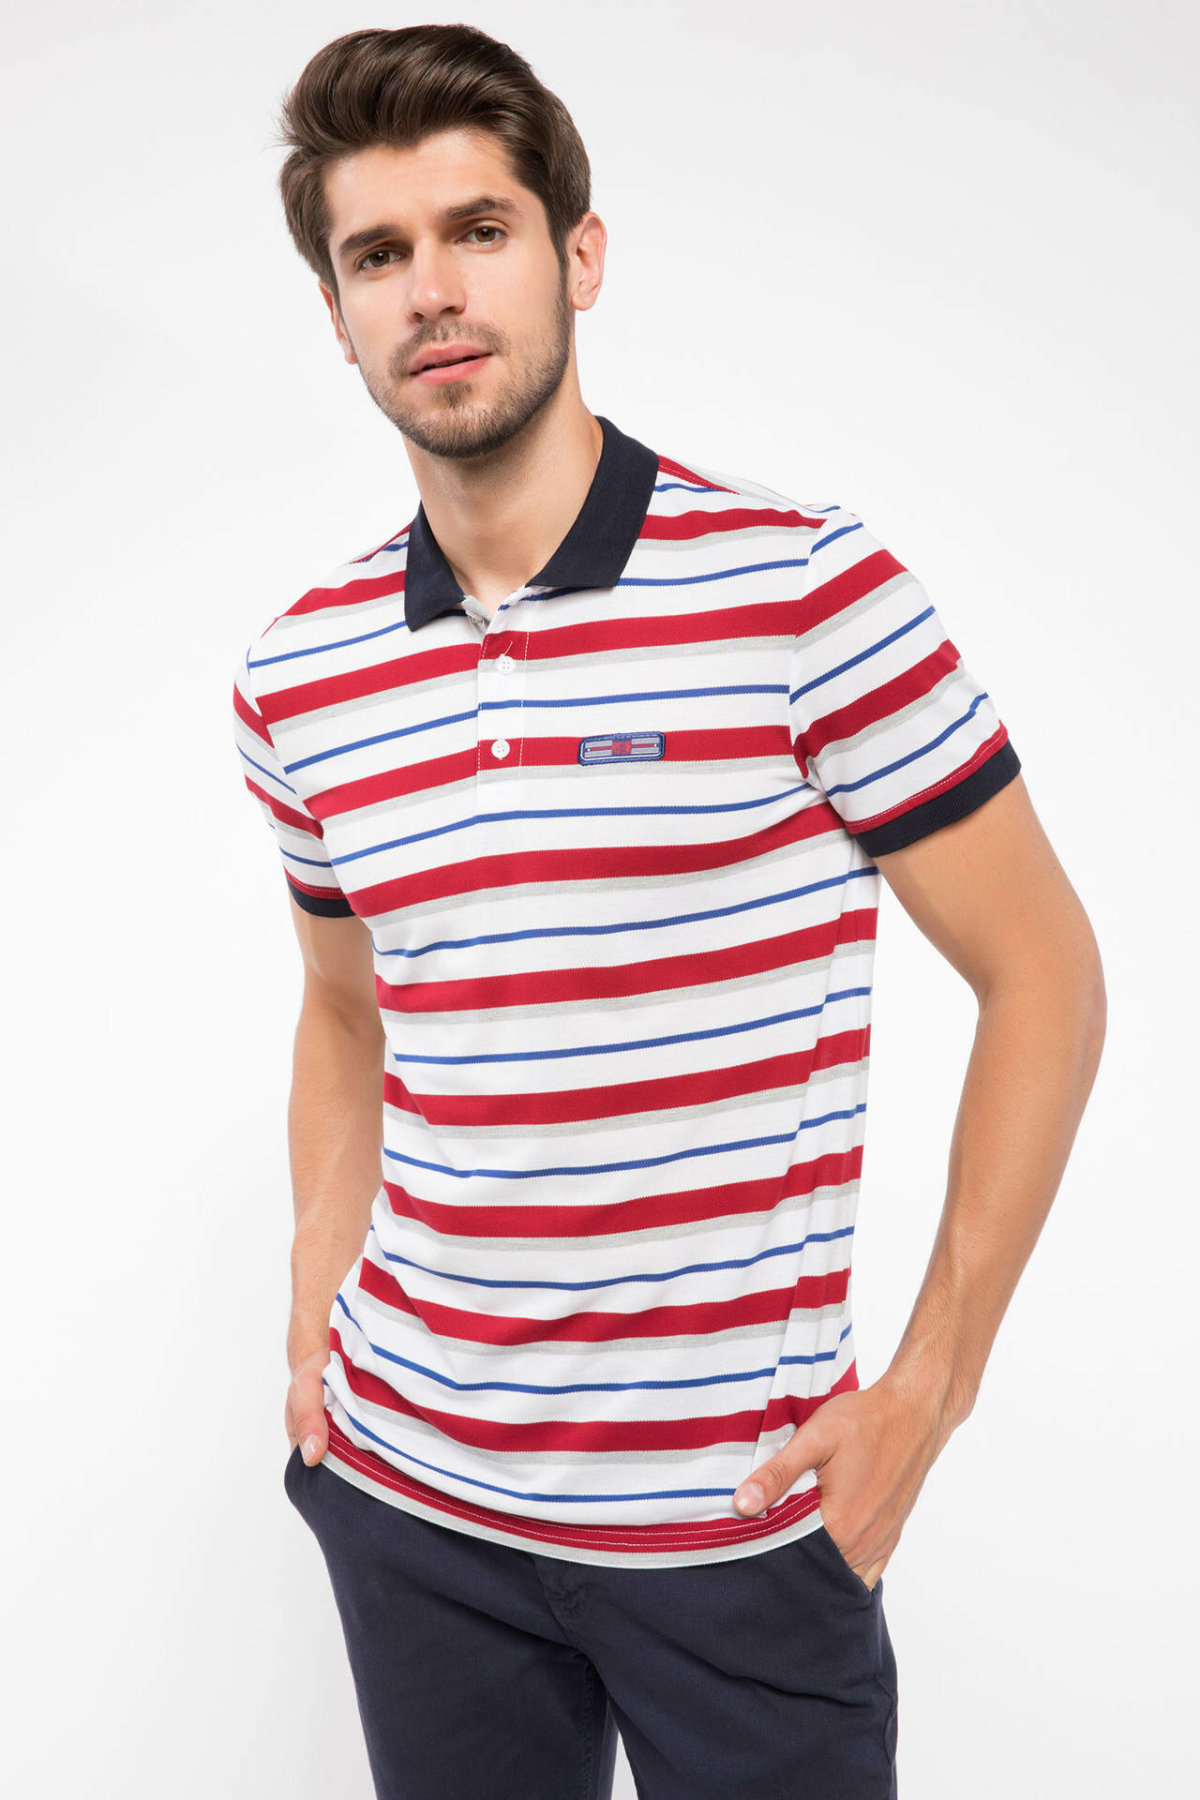 DeFacto Man Classic Striped Polo Shirt Men Casual Smart Short Sleeve POLO Shirts Summer Fit Slim Top Shirts-J1902AZ18AU